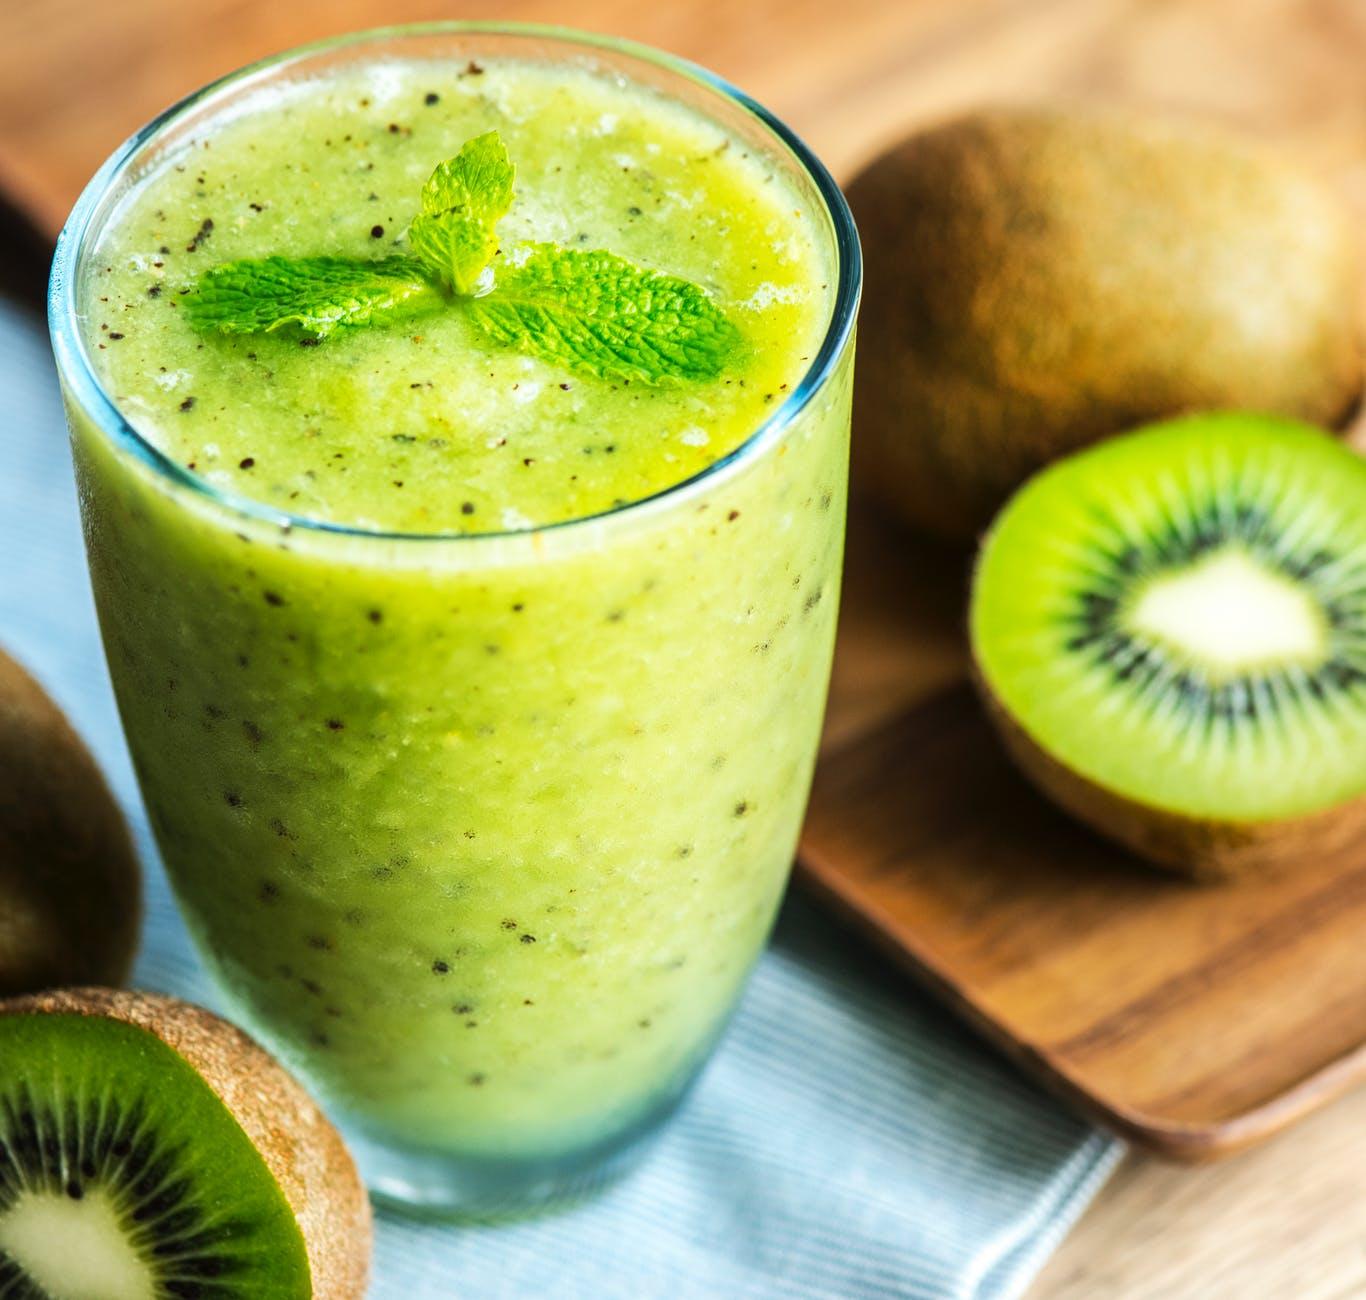 photo of kiwi smoothie filled glass